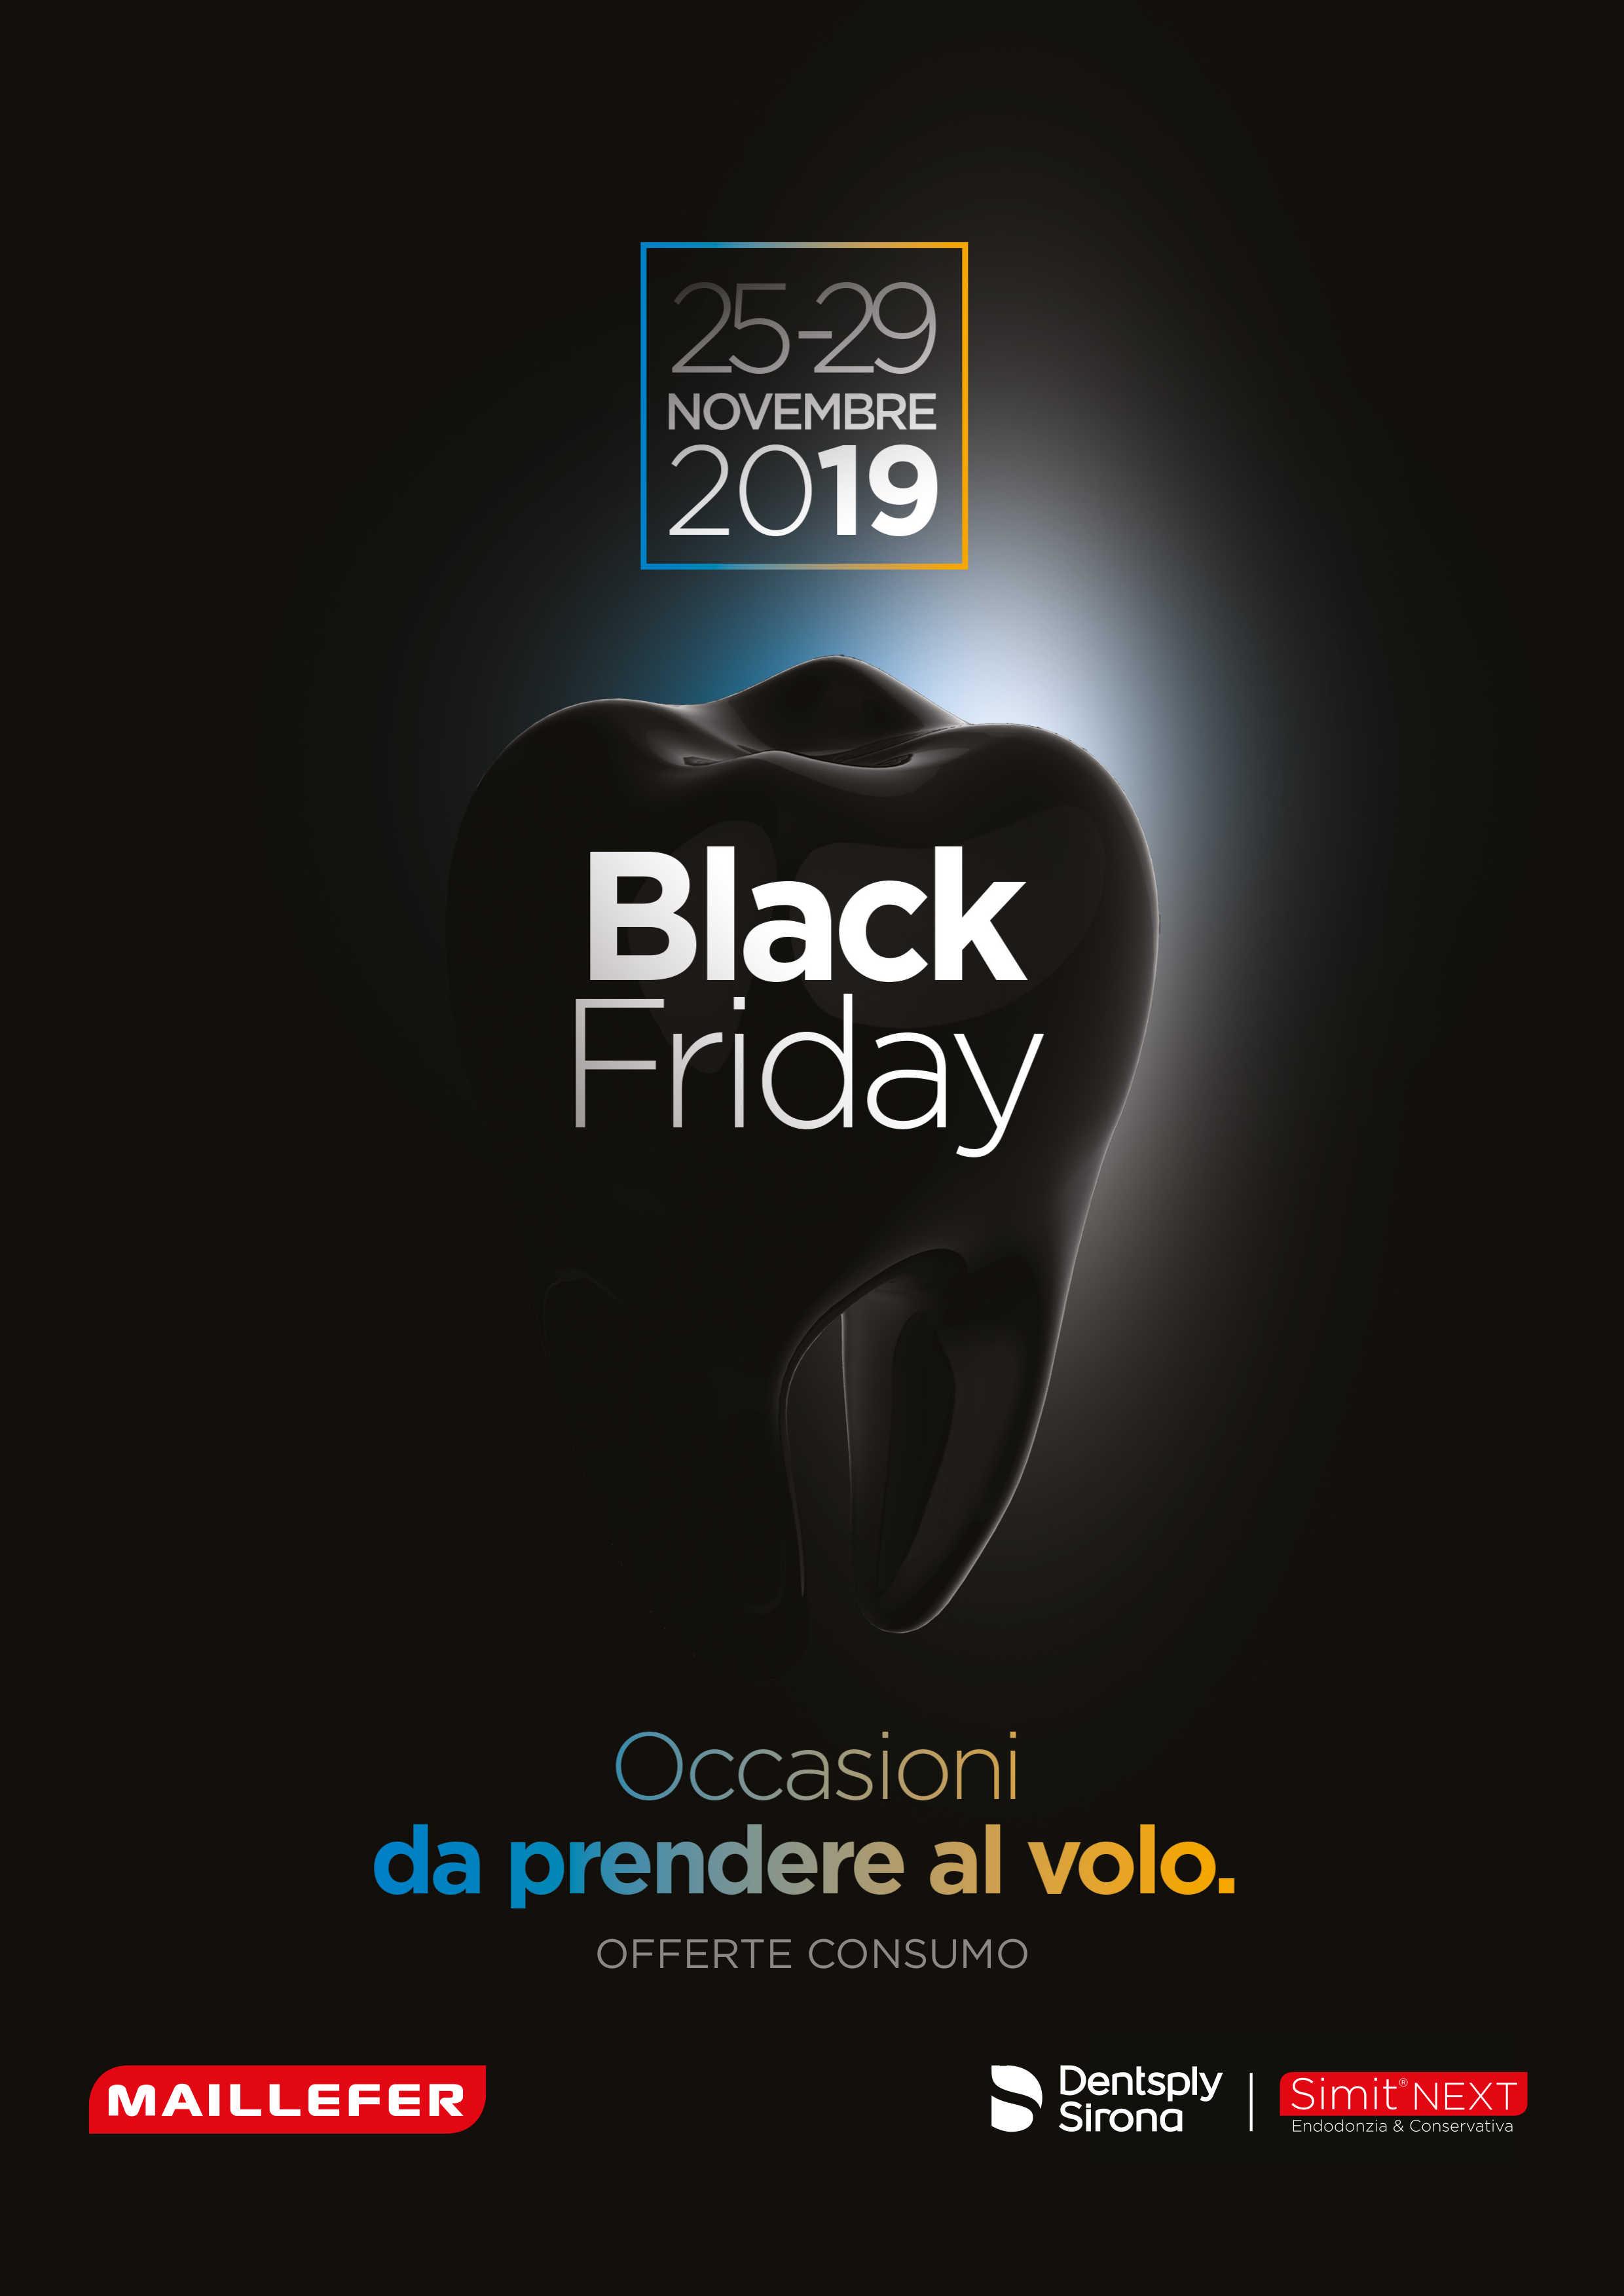 Promo Black Friday novembre 2019 simit